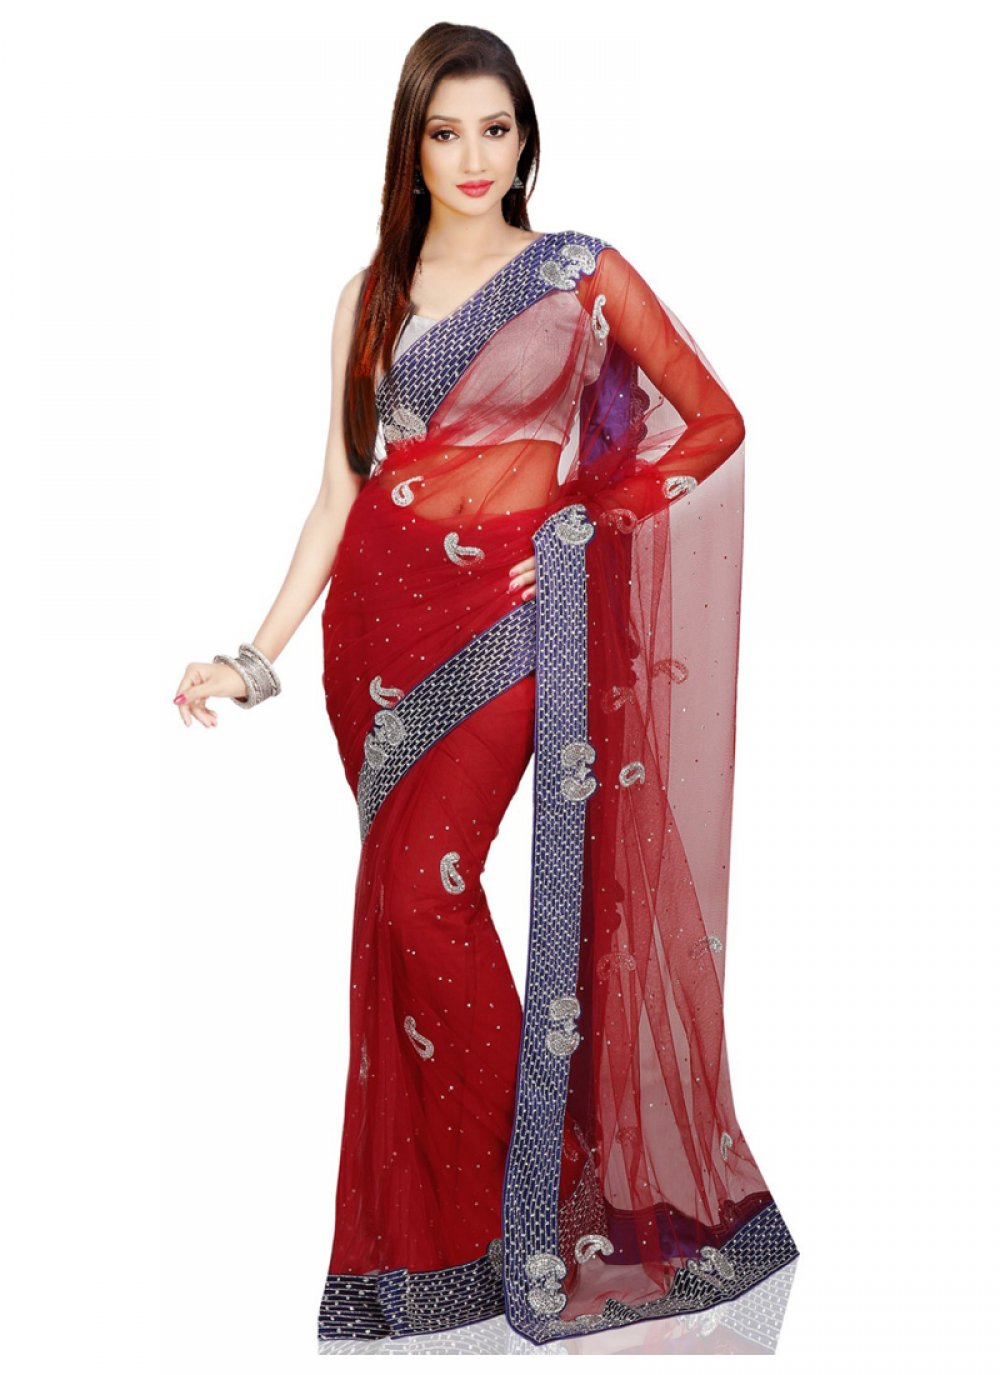 Cutdana Work Designer Bridal Sarees